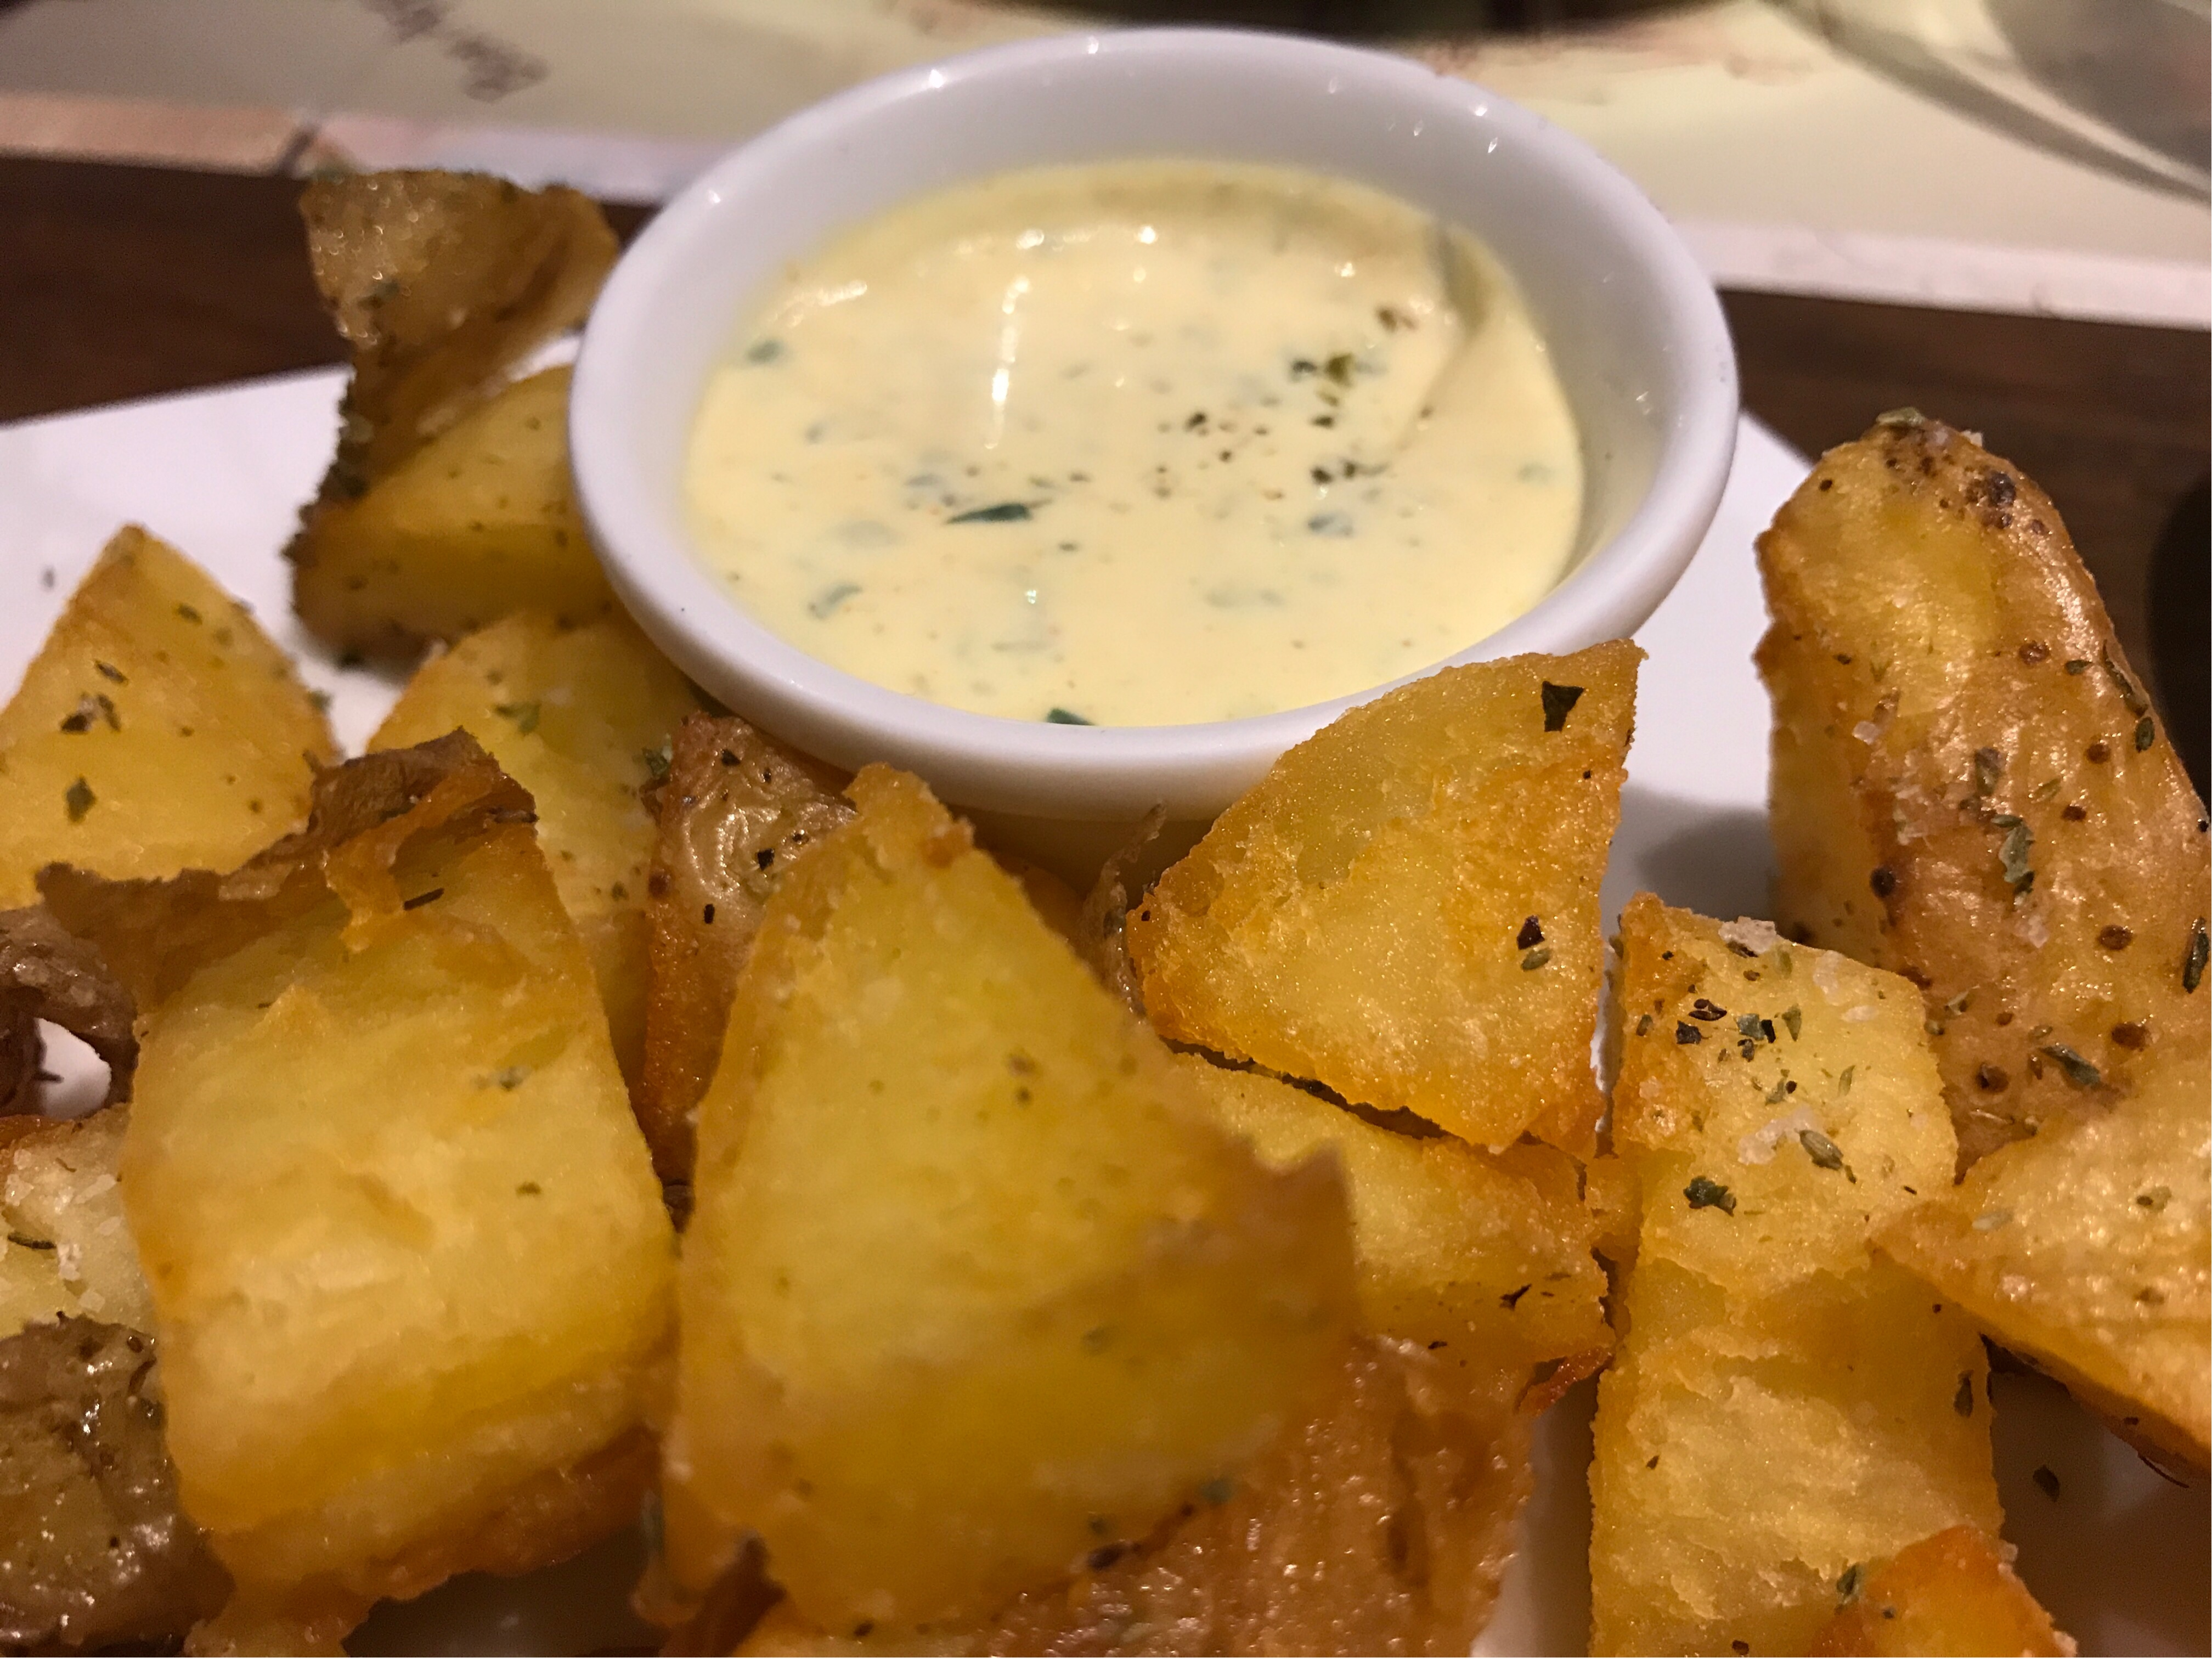 En skål med lysegul saus omgitt av potetbiter